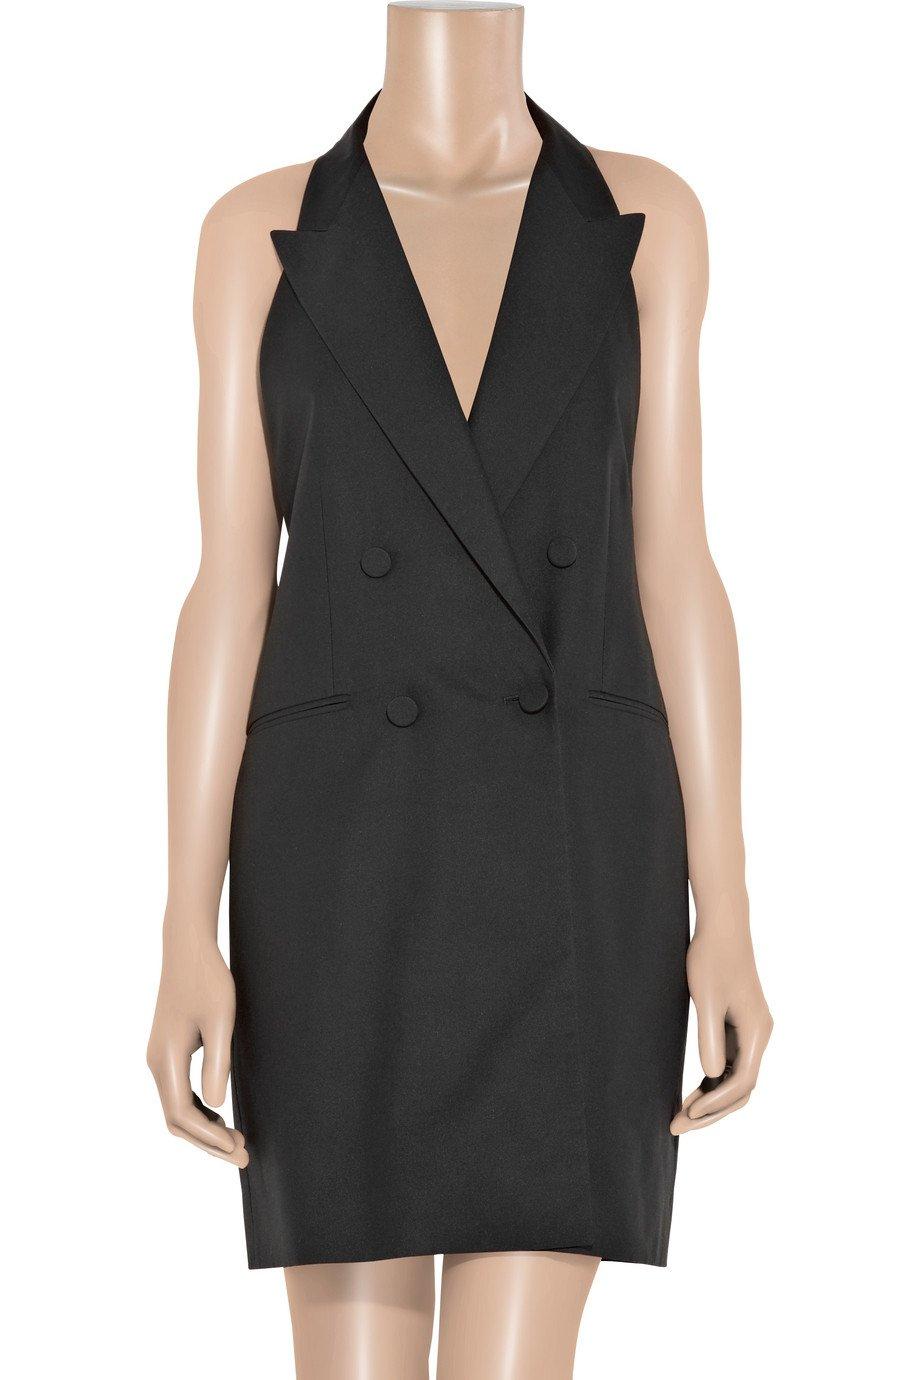 456db35560 Lyst - Stella McCartney Backless Silk-broadcloth Tuxedo Dress in Black